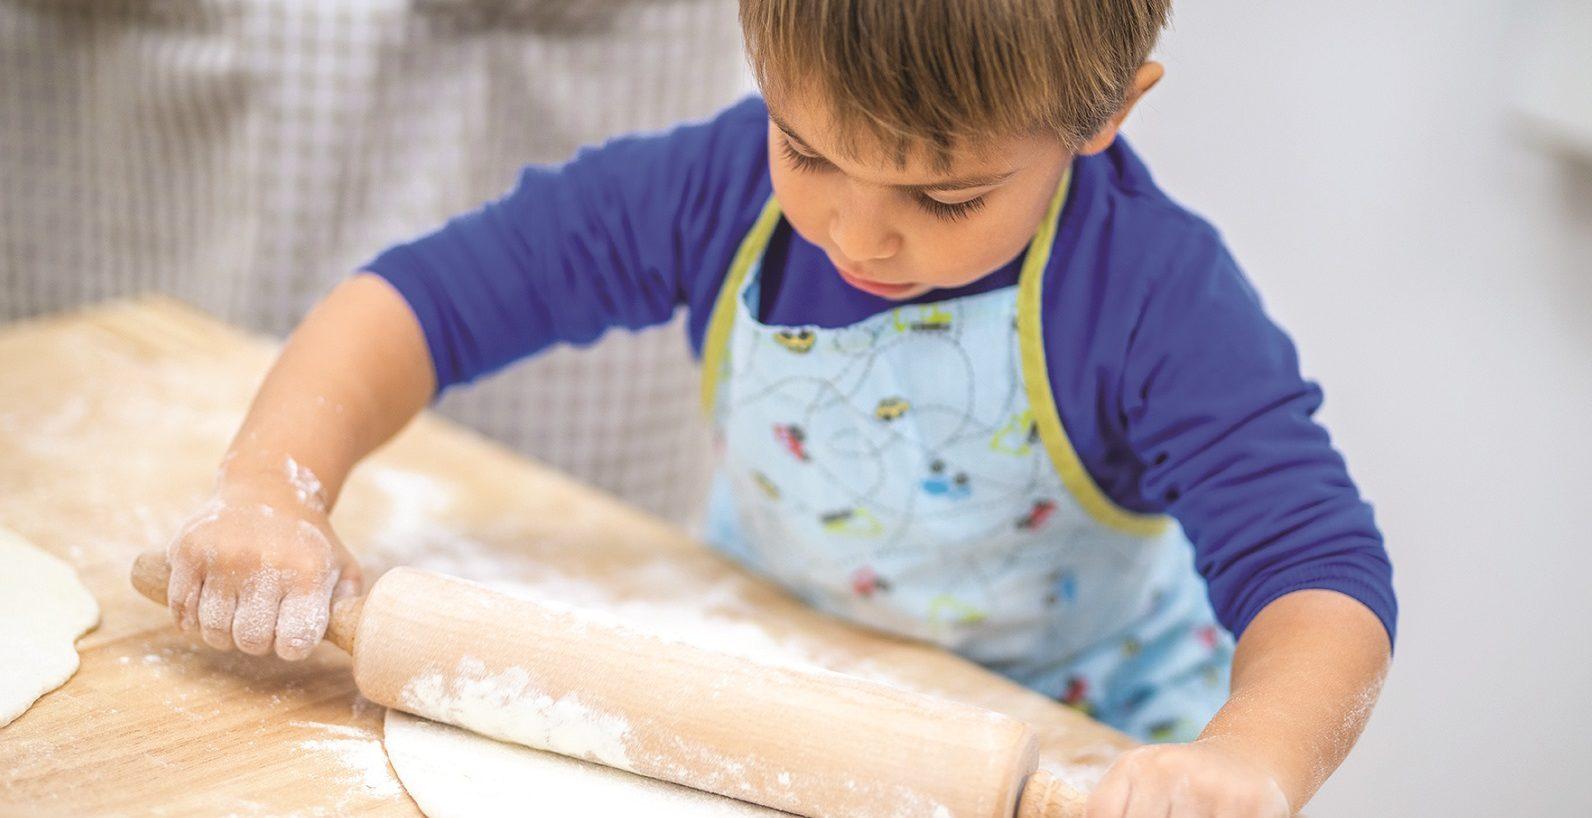 Little boy rolling dough